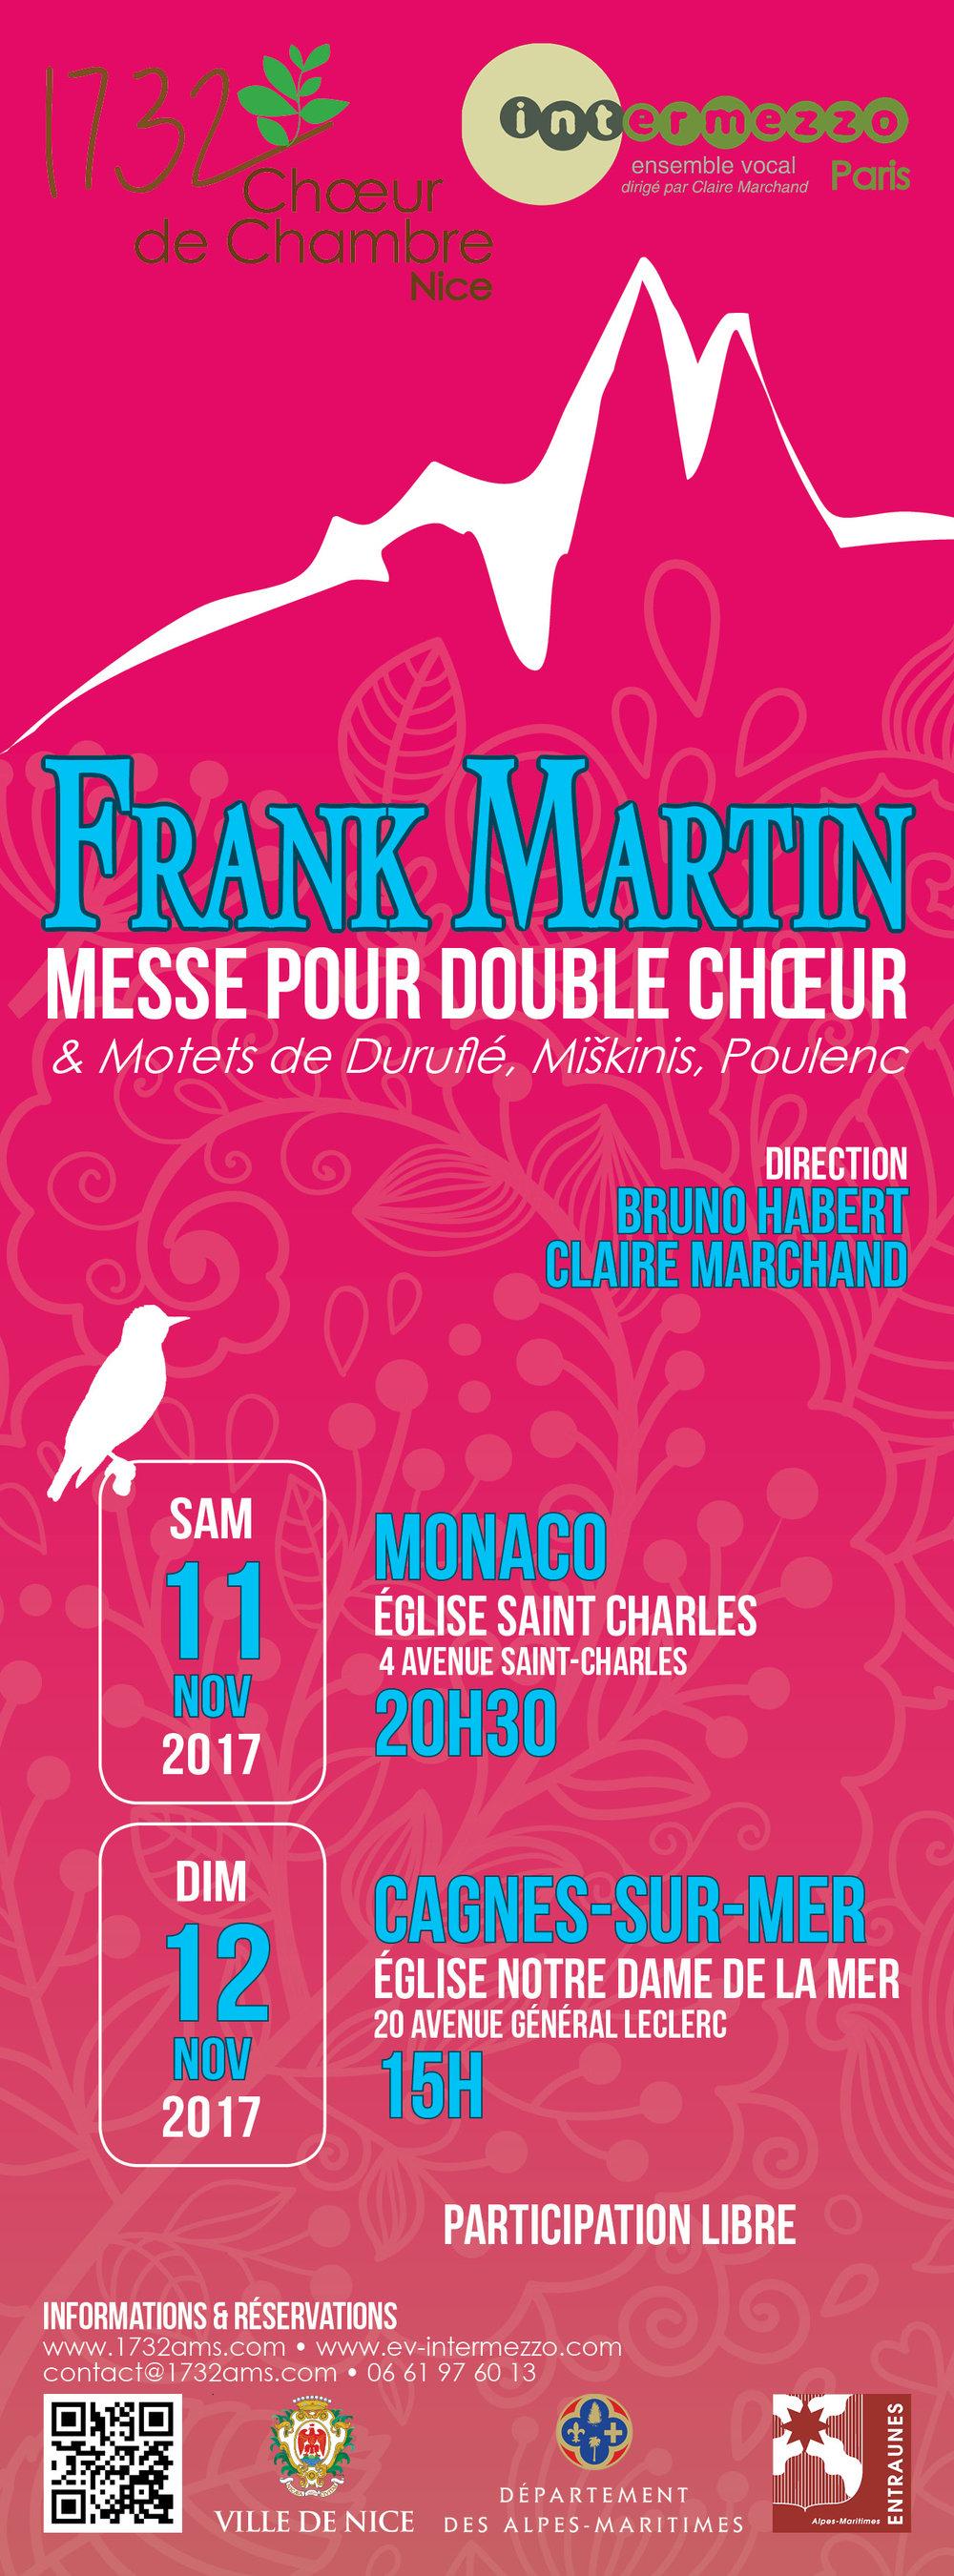 Affiche 1732 Frank Martin 2017-11.jpg